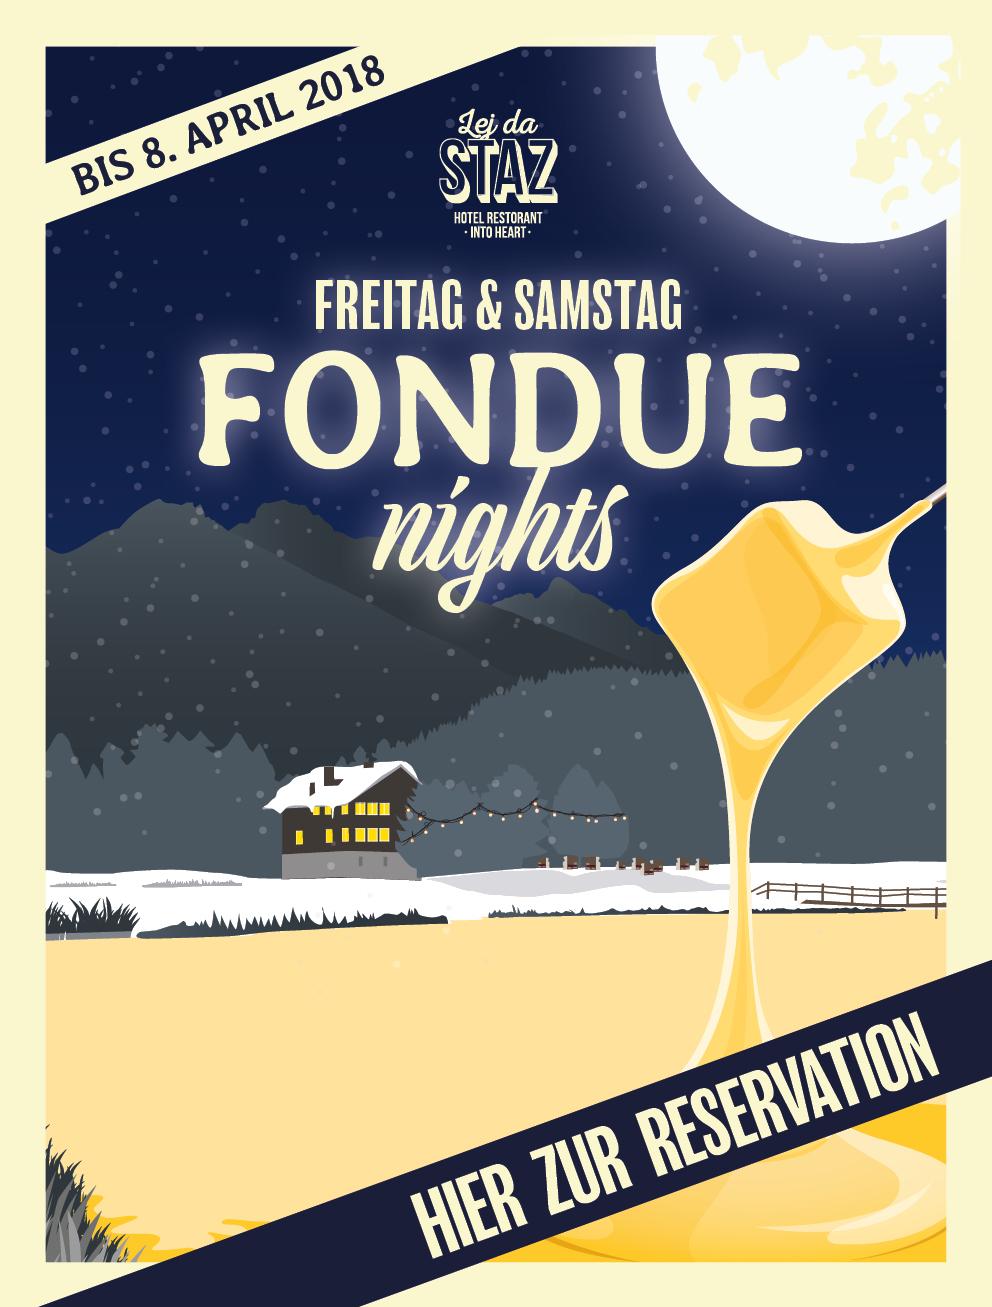 lejdastaz-fondue-nights-freitags-samstags